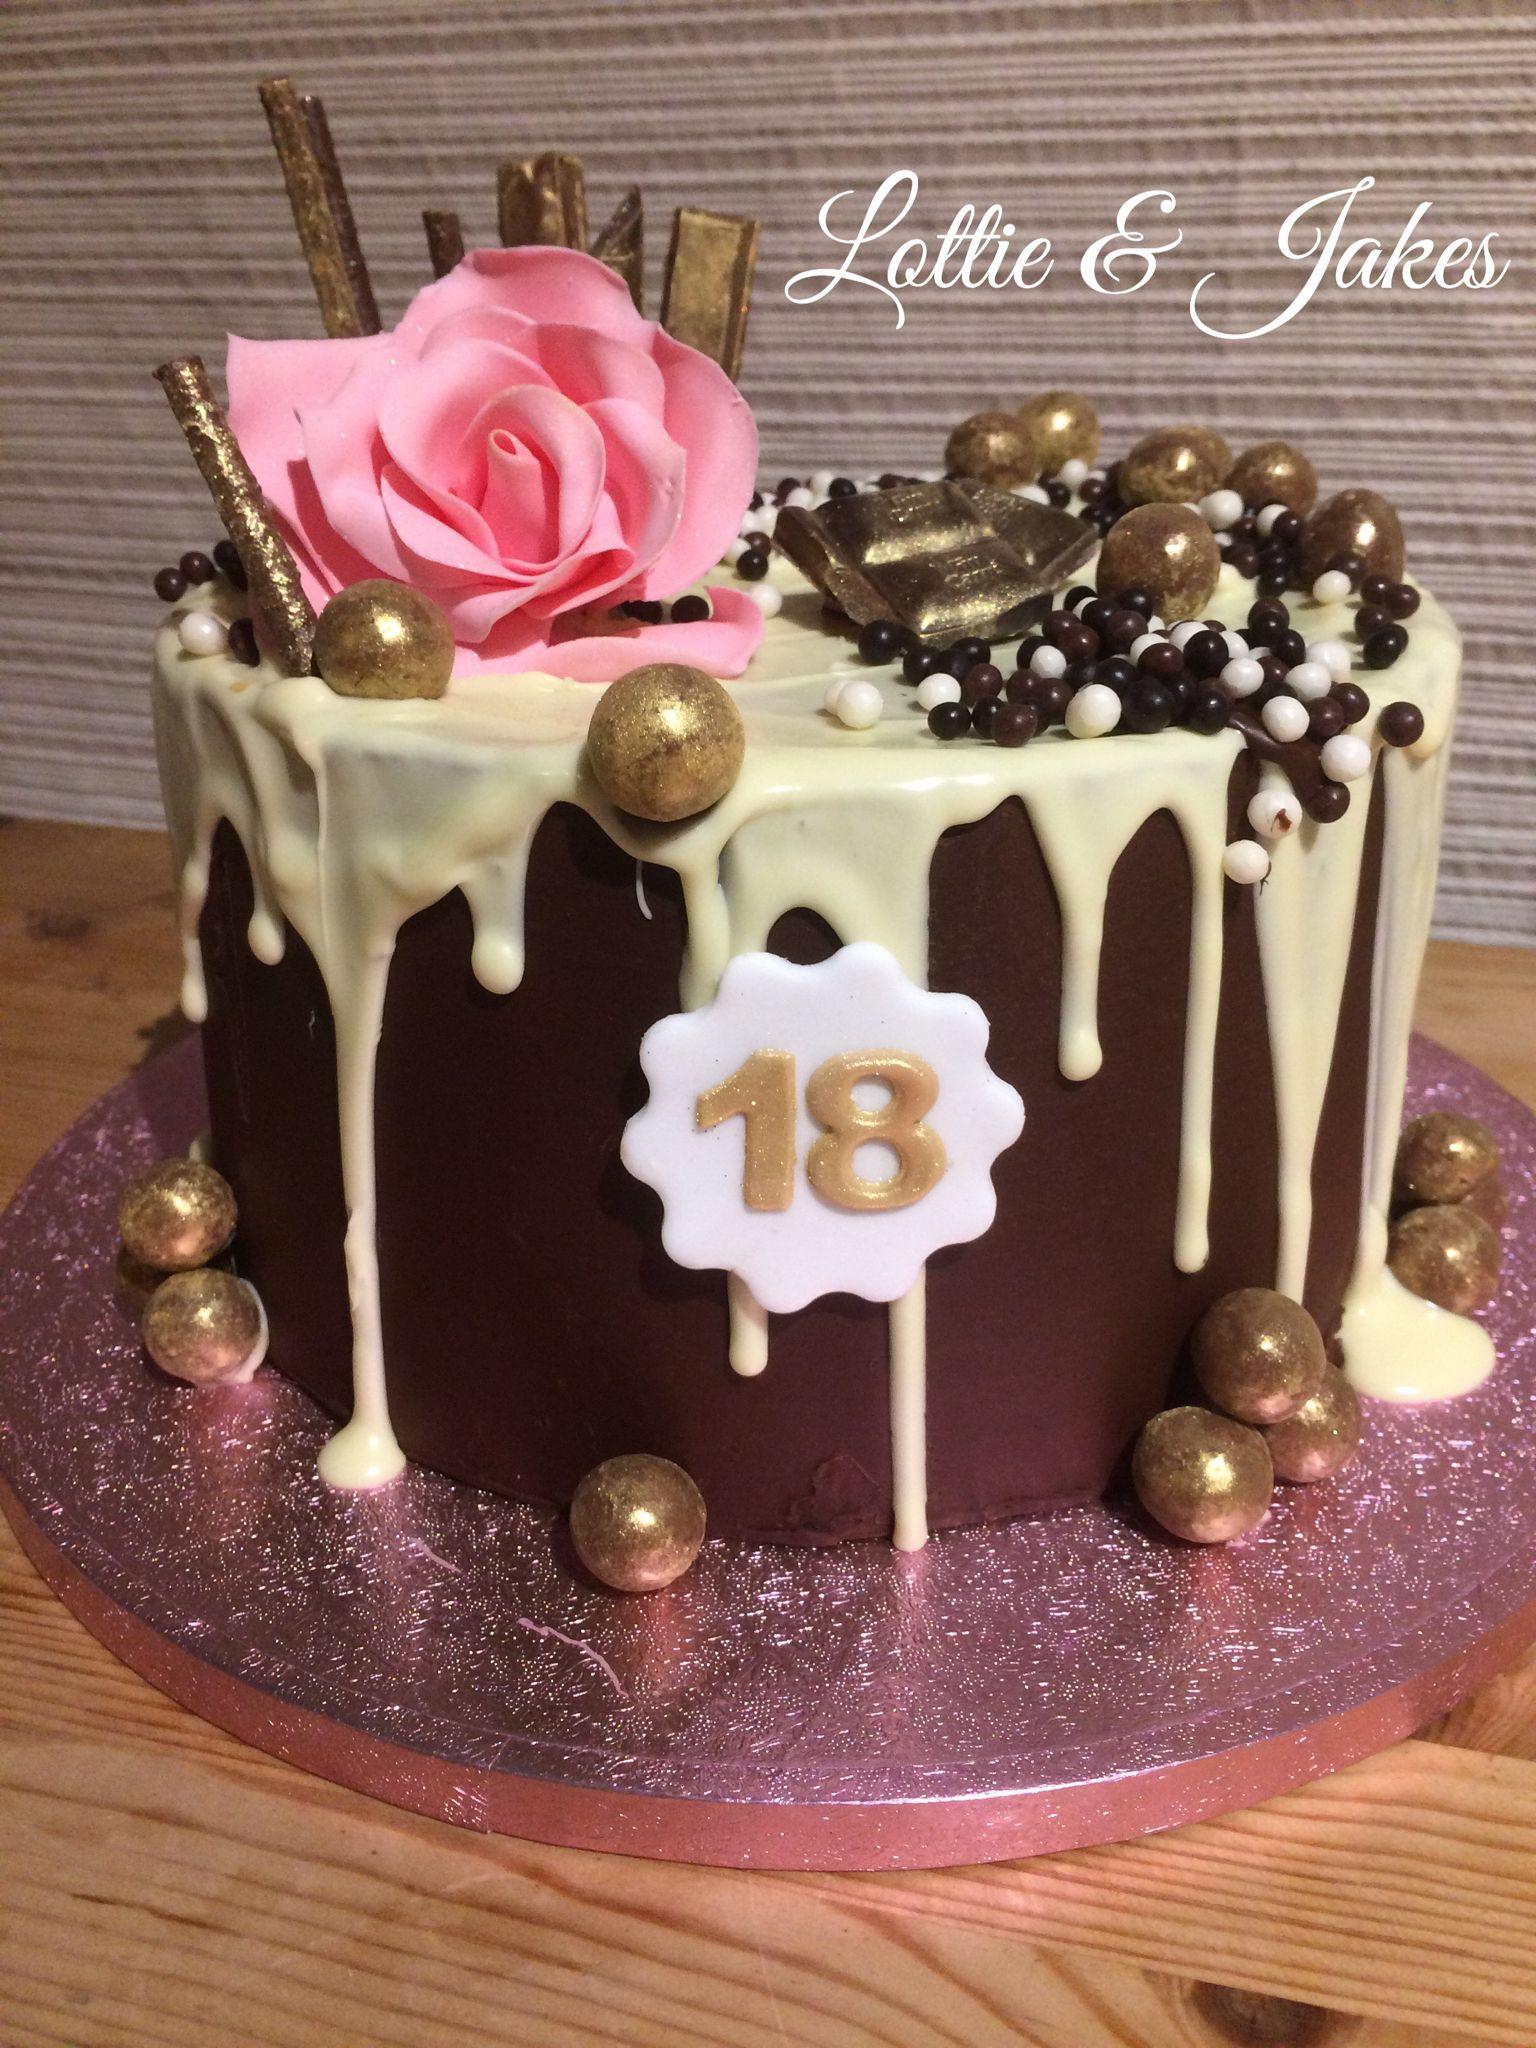 Stunning Drip Cake For An 18th Birthday Cake Birthday Cake